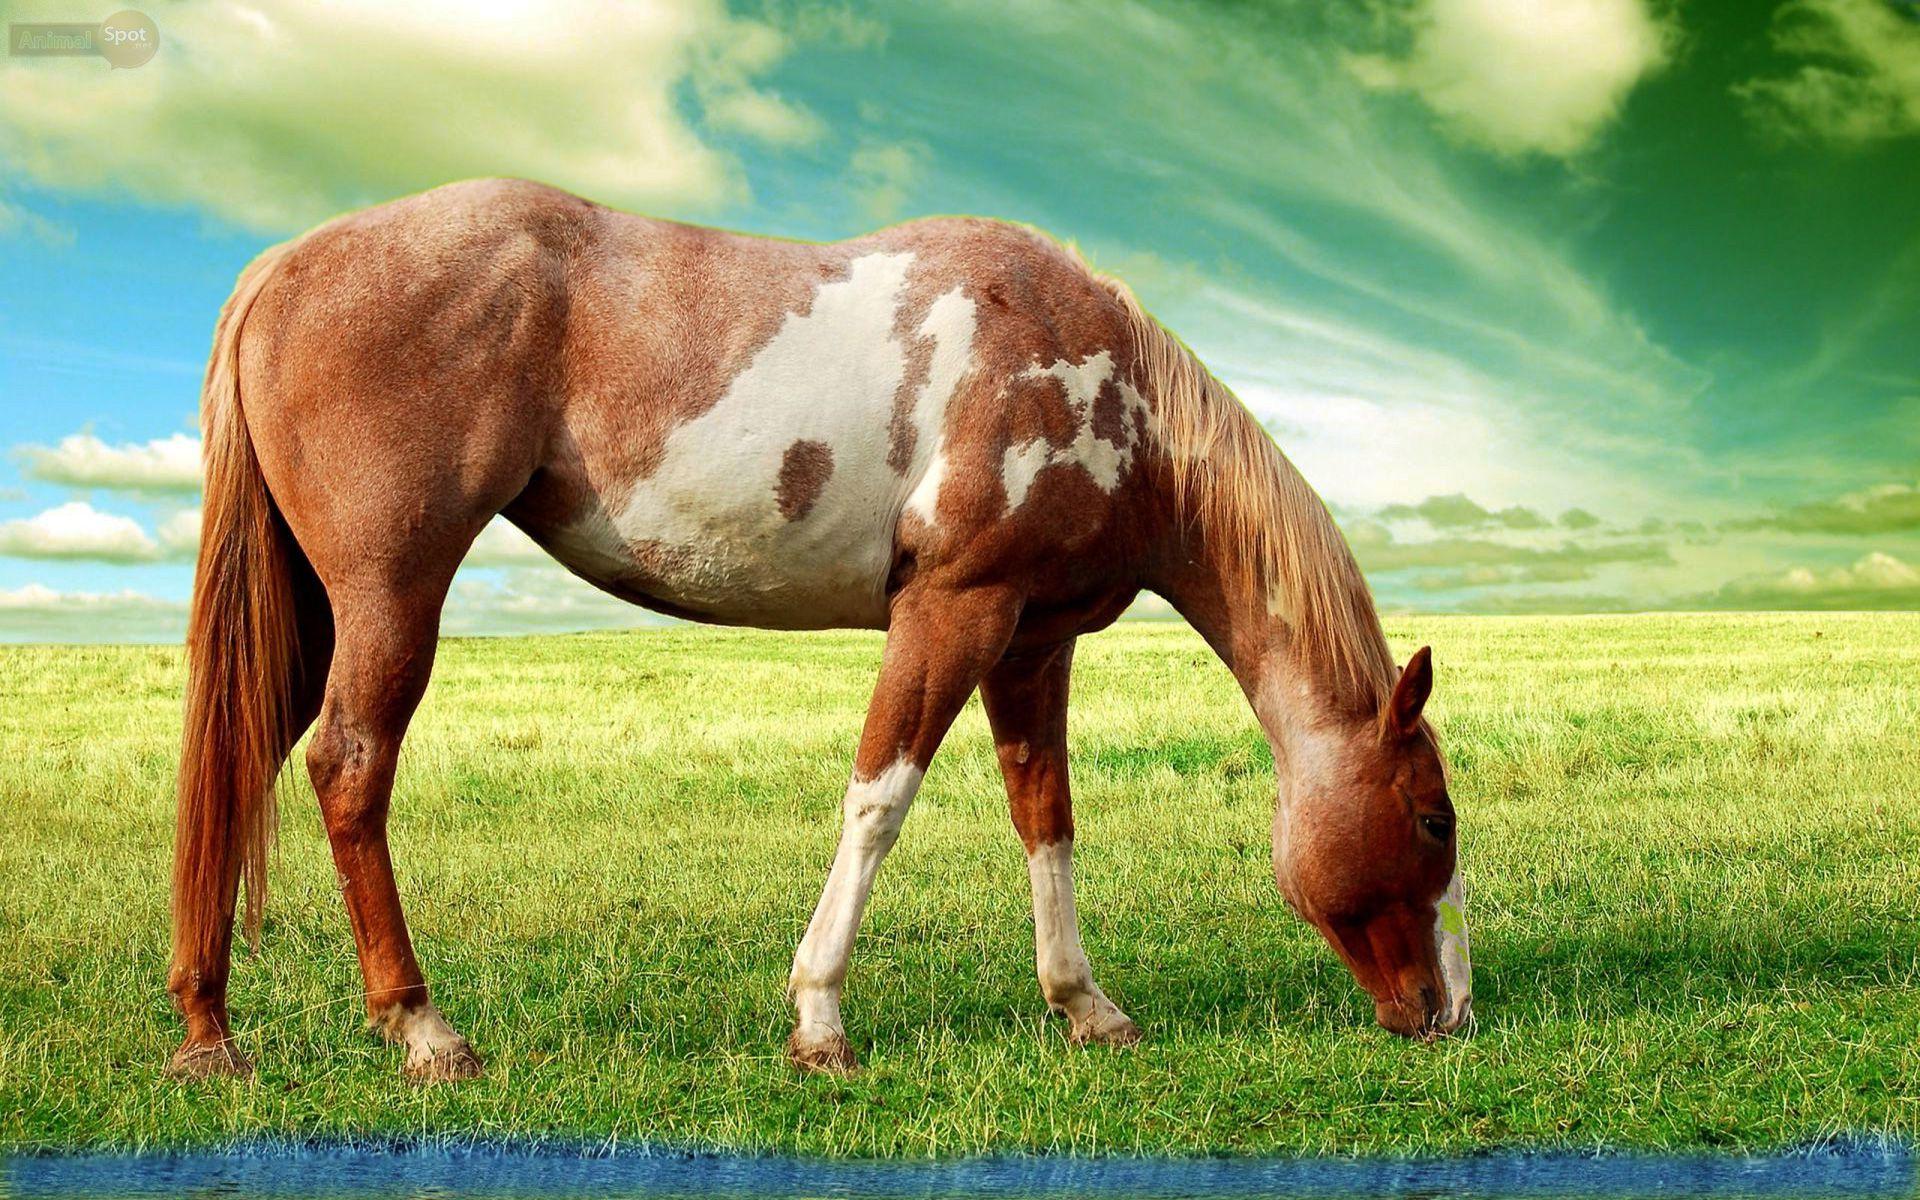 Top Wallpaper Horse Green - 589771b0e9f1edb9bed57860a39f5e92  HD_904310.jpg